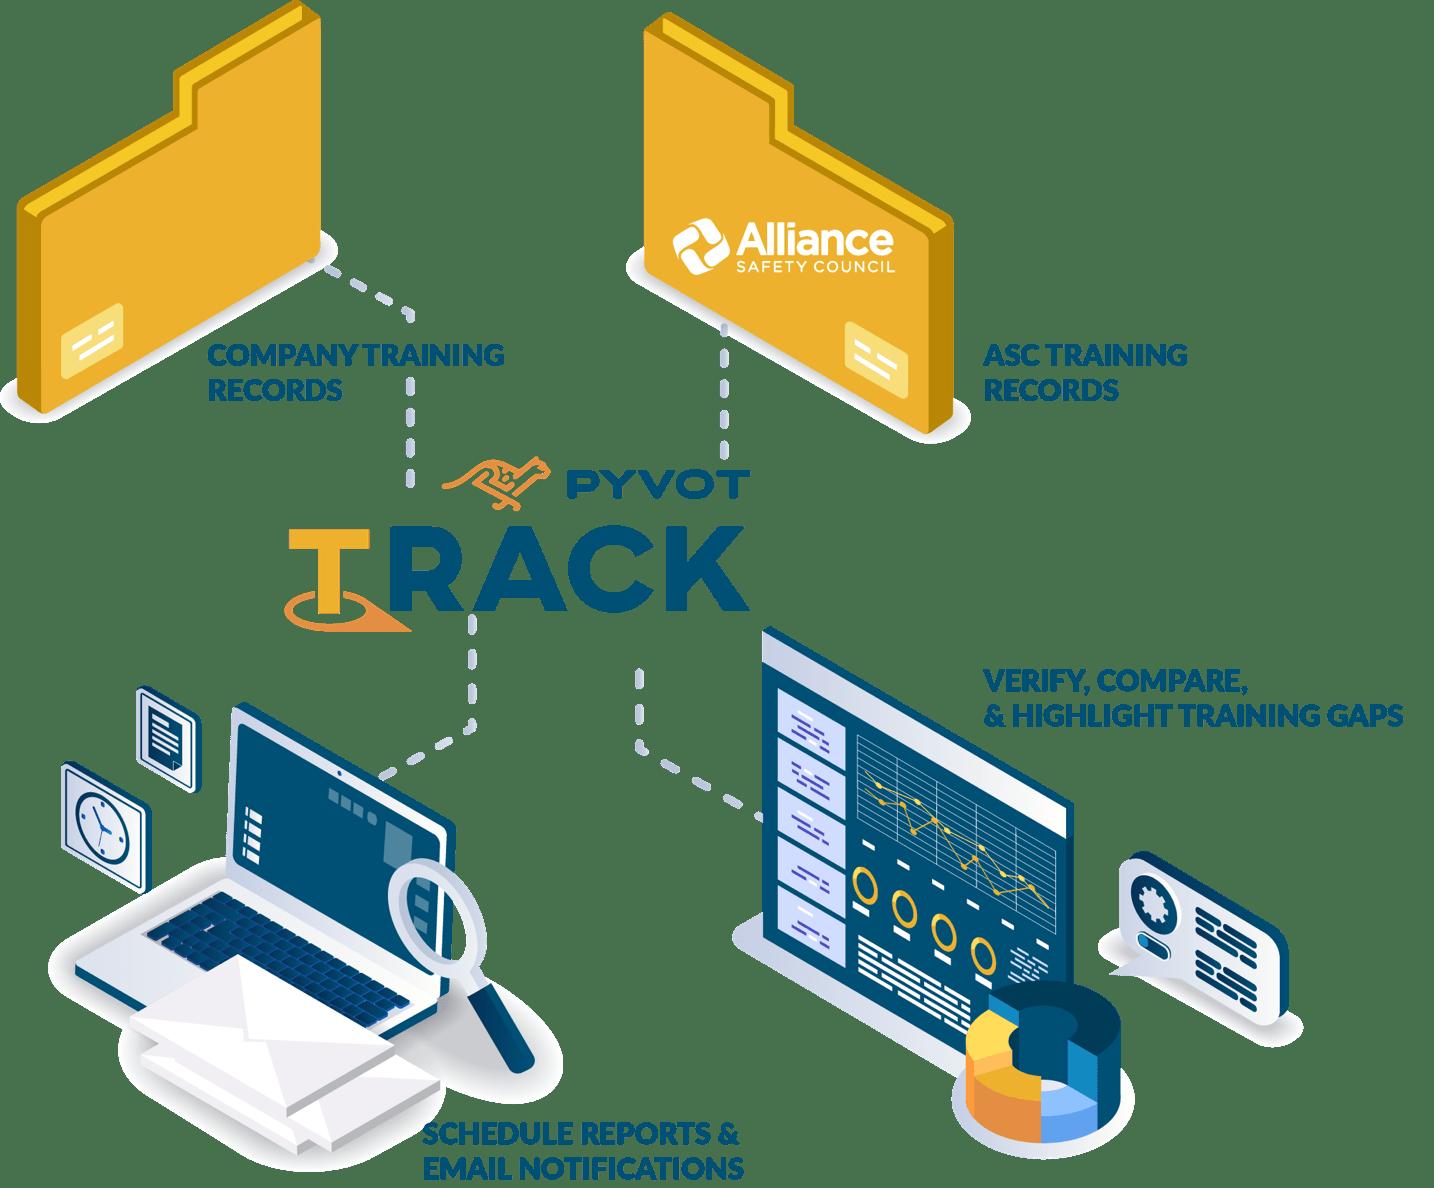 Pyvot Track Workforce Technology